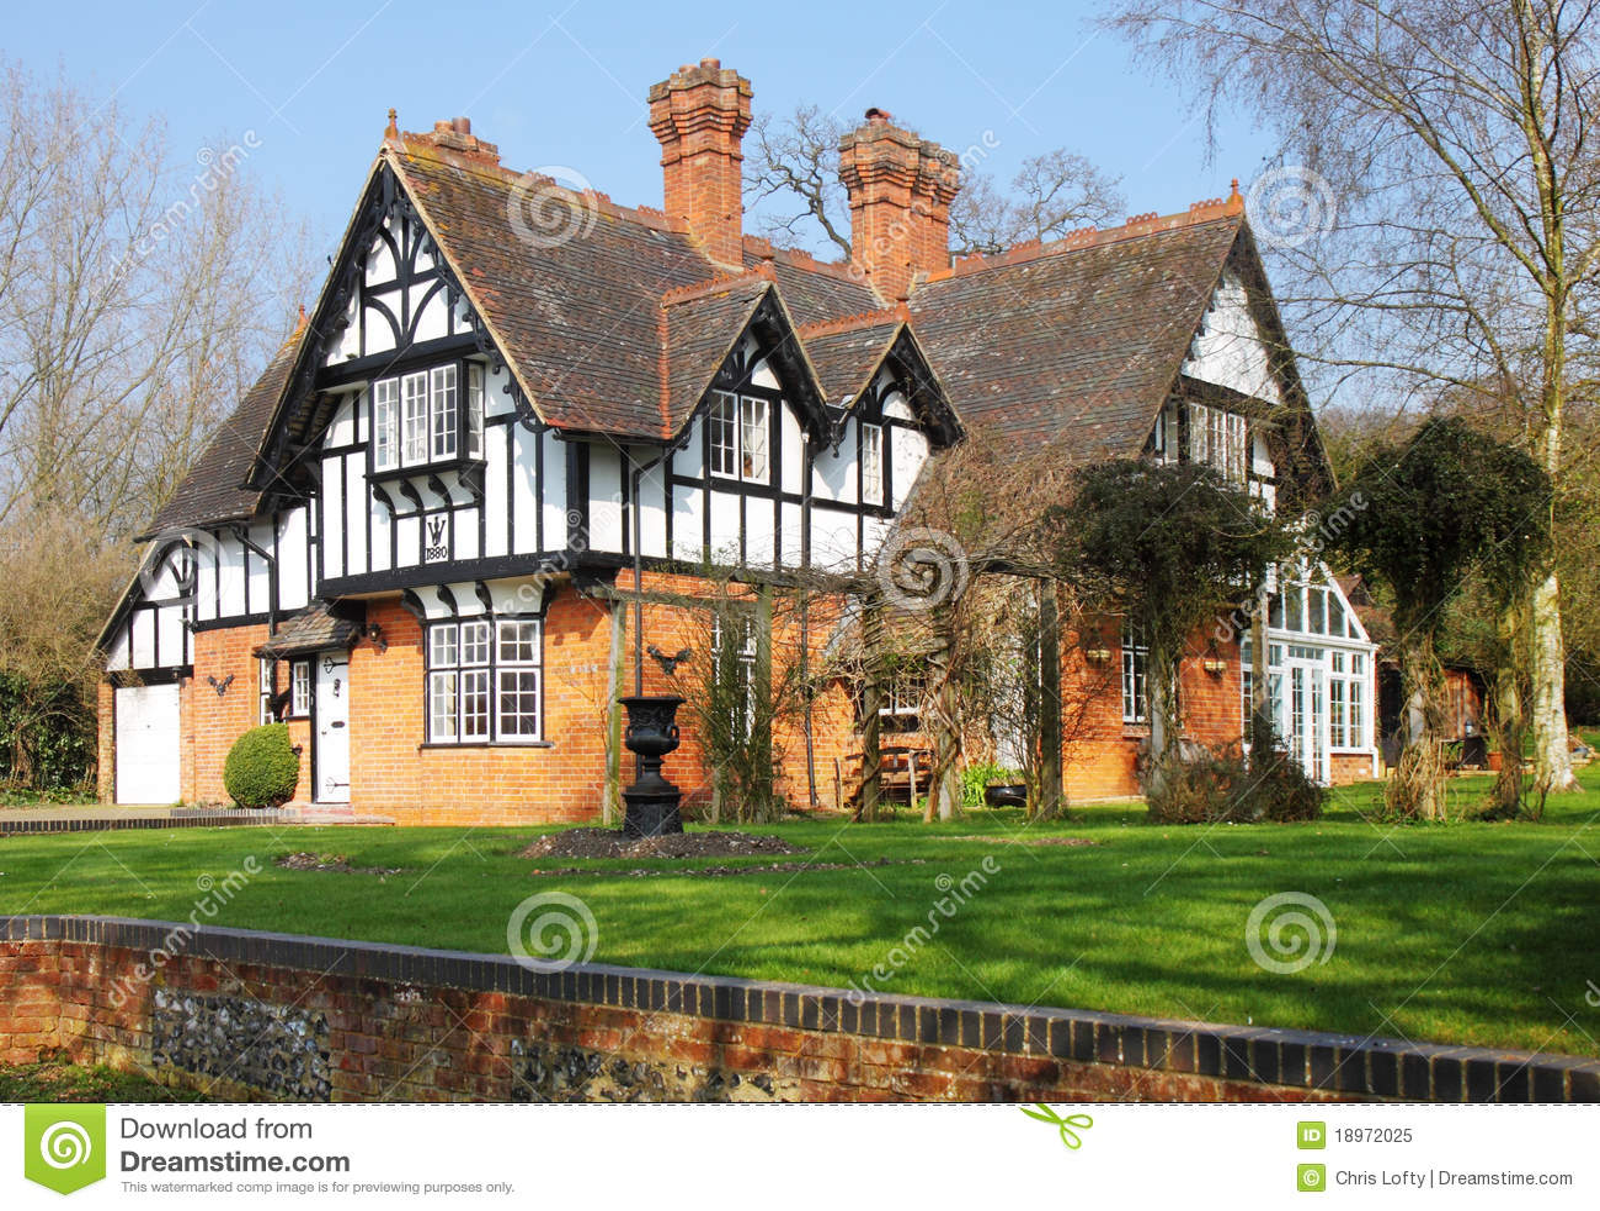 Casa rural inglesa enmarcada madera imagen de archivo - Casa rural de madera ...